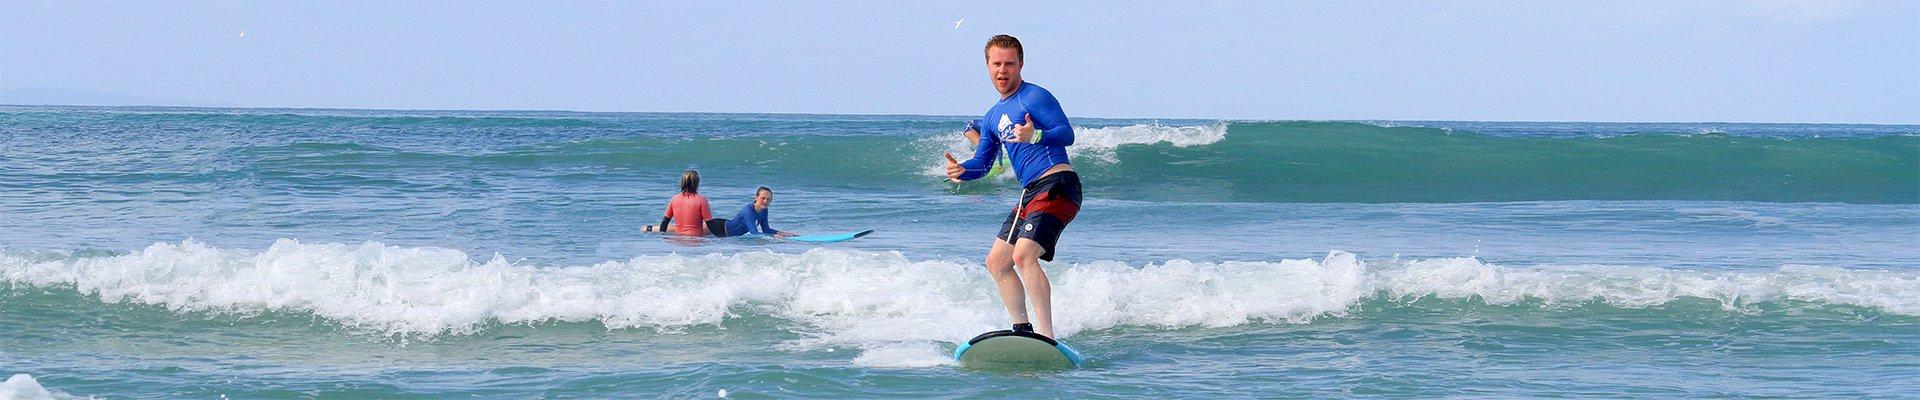 Surf Lessons Punta Mita